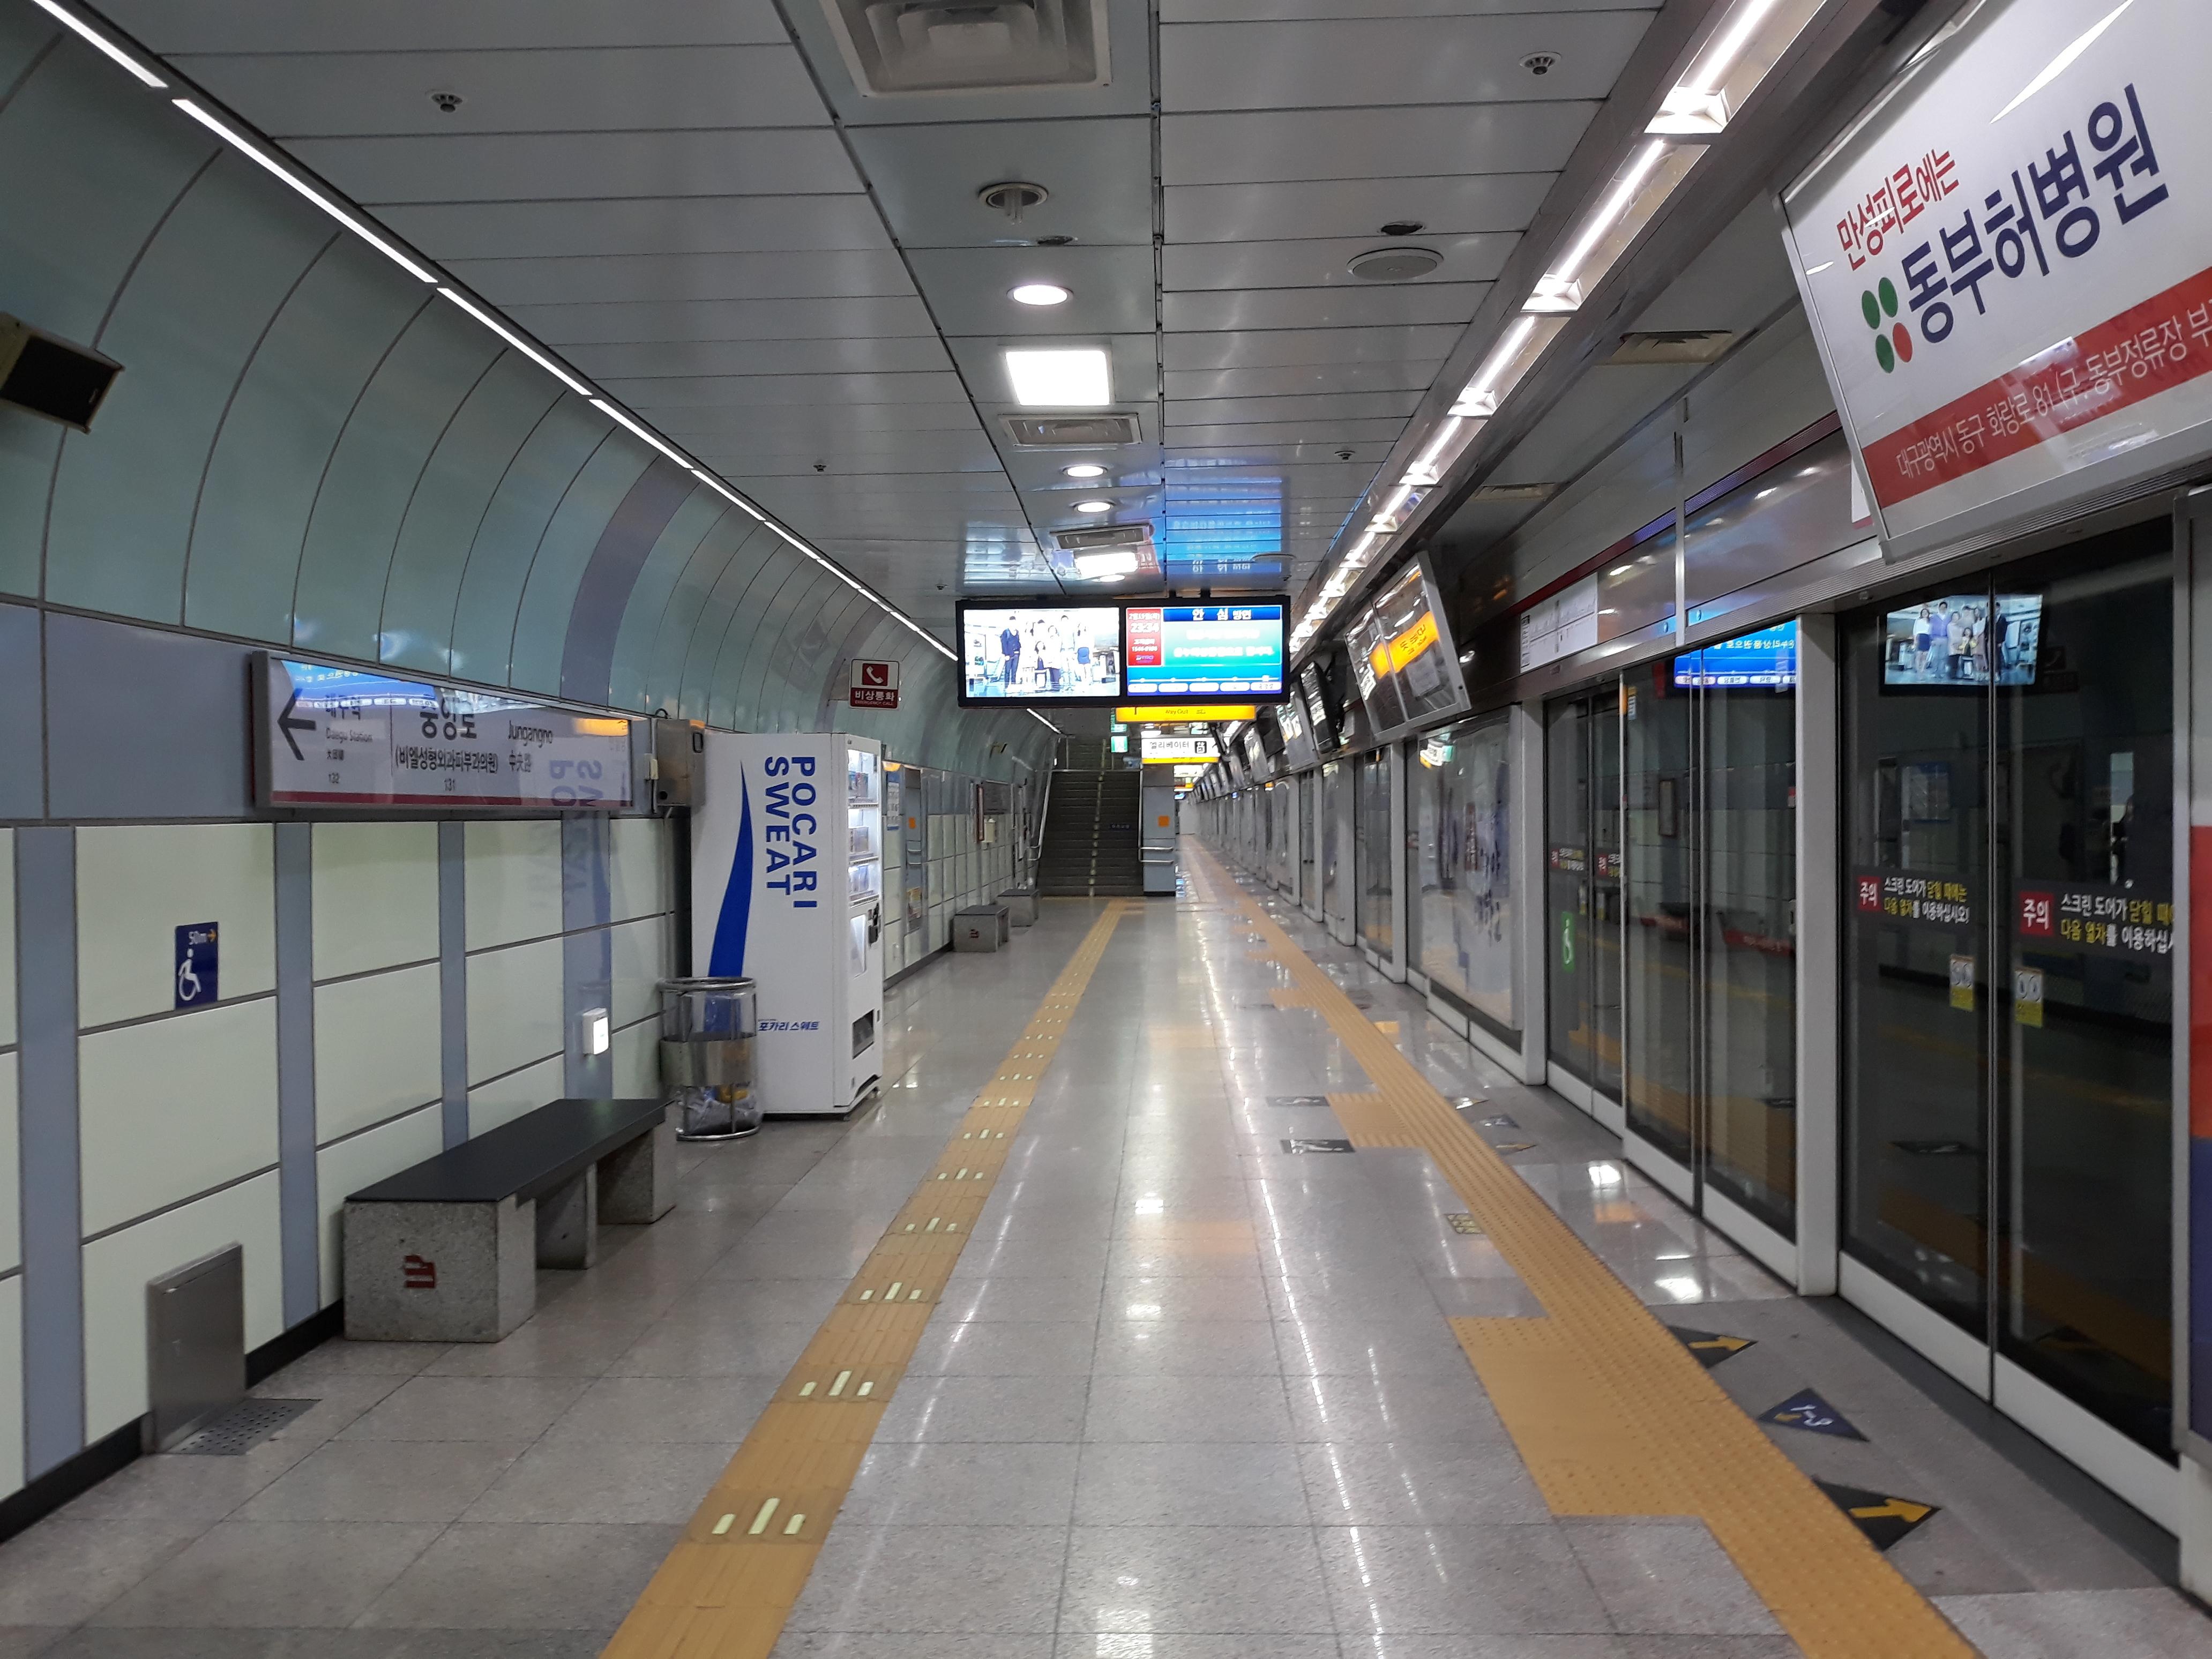 Daegu Jungangno Station 20180215 233453 4114 photo.jpg